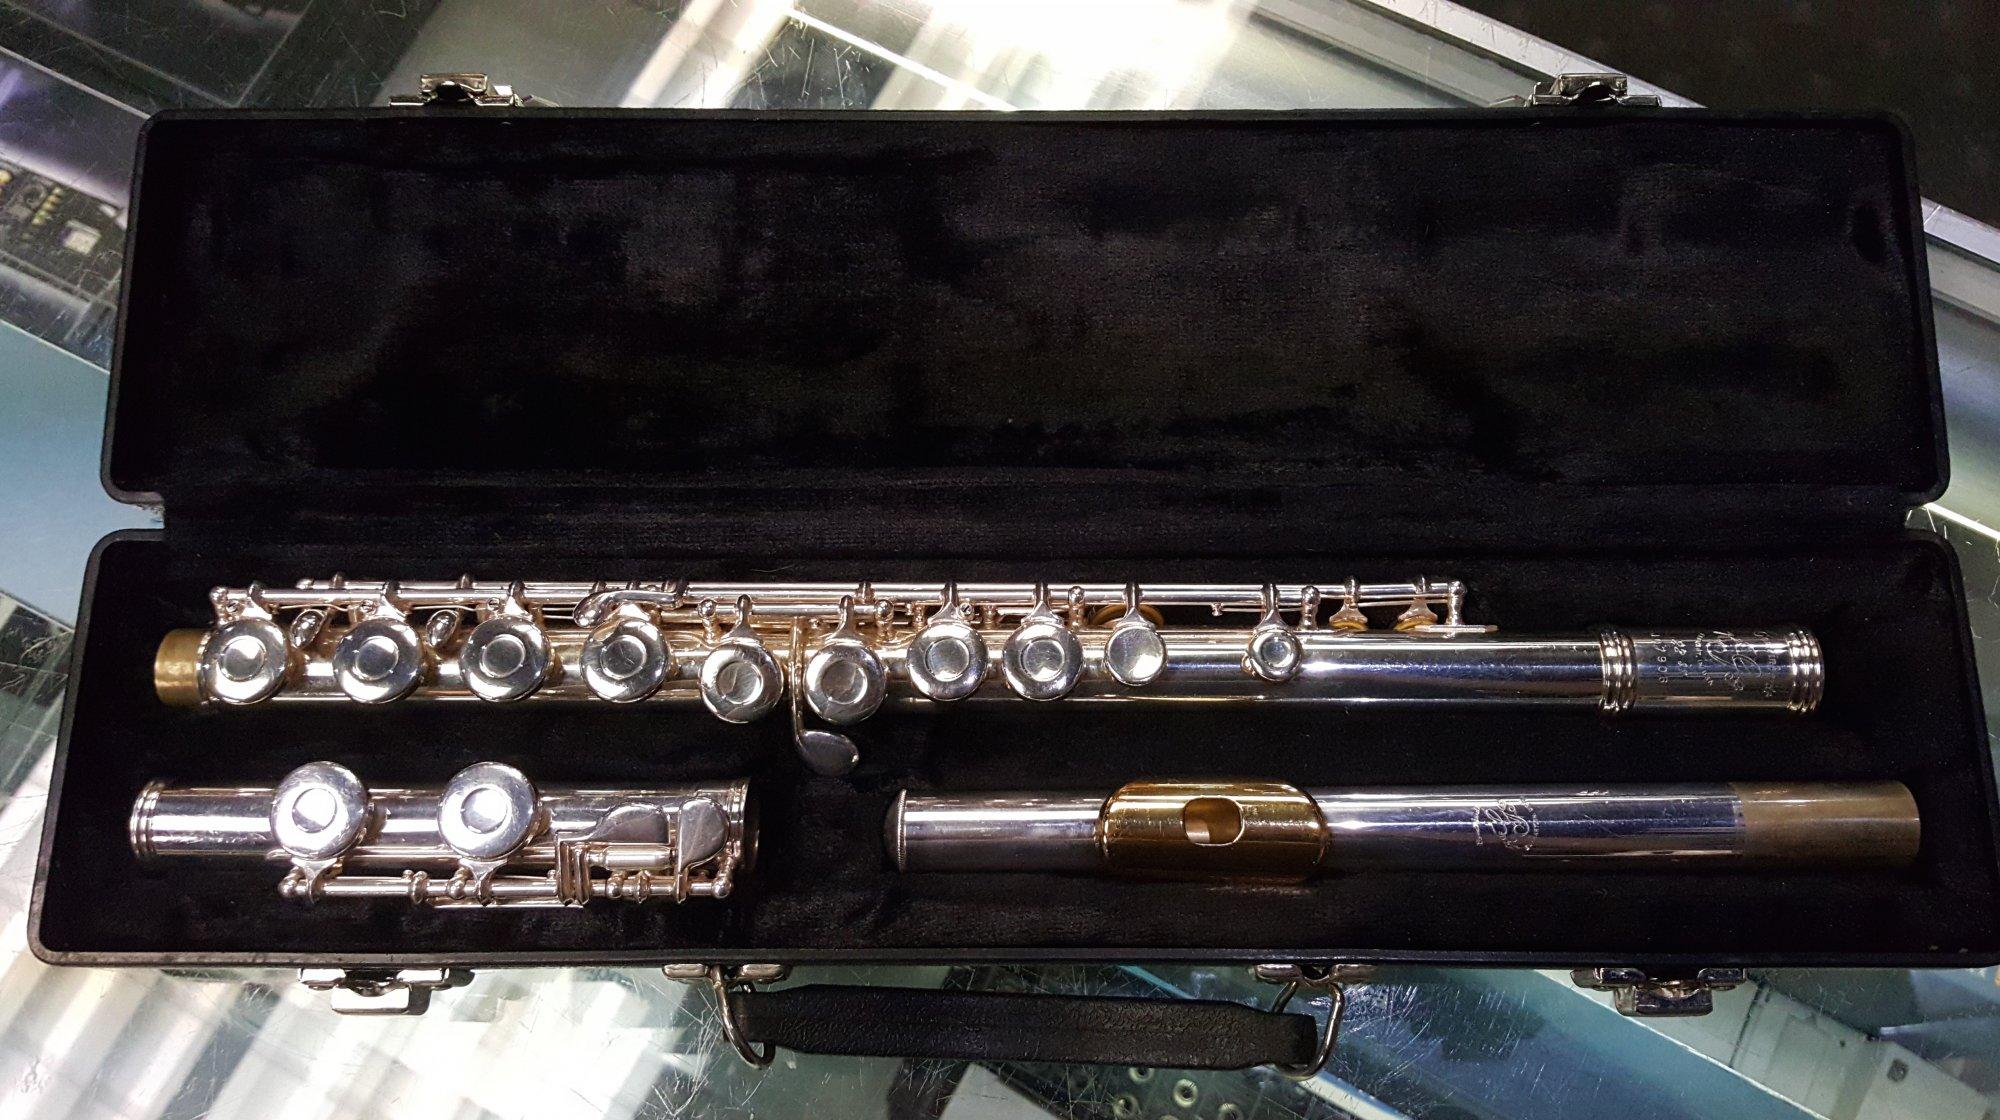 Used Gemeinhardt USA 22SP Flute w/ Case